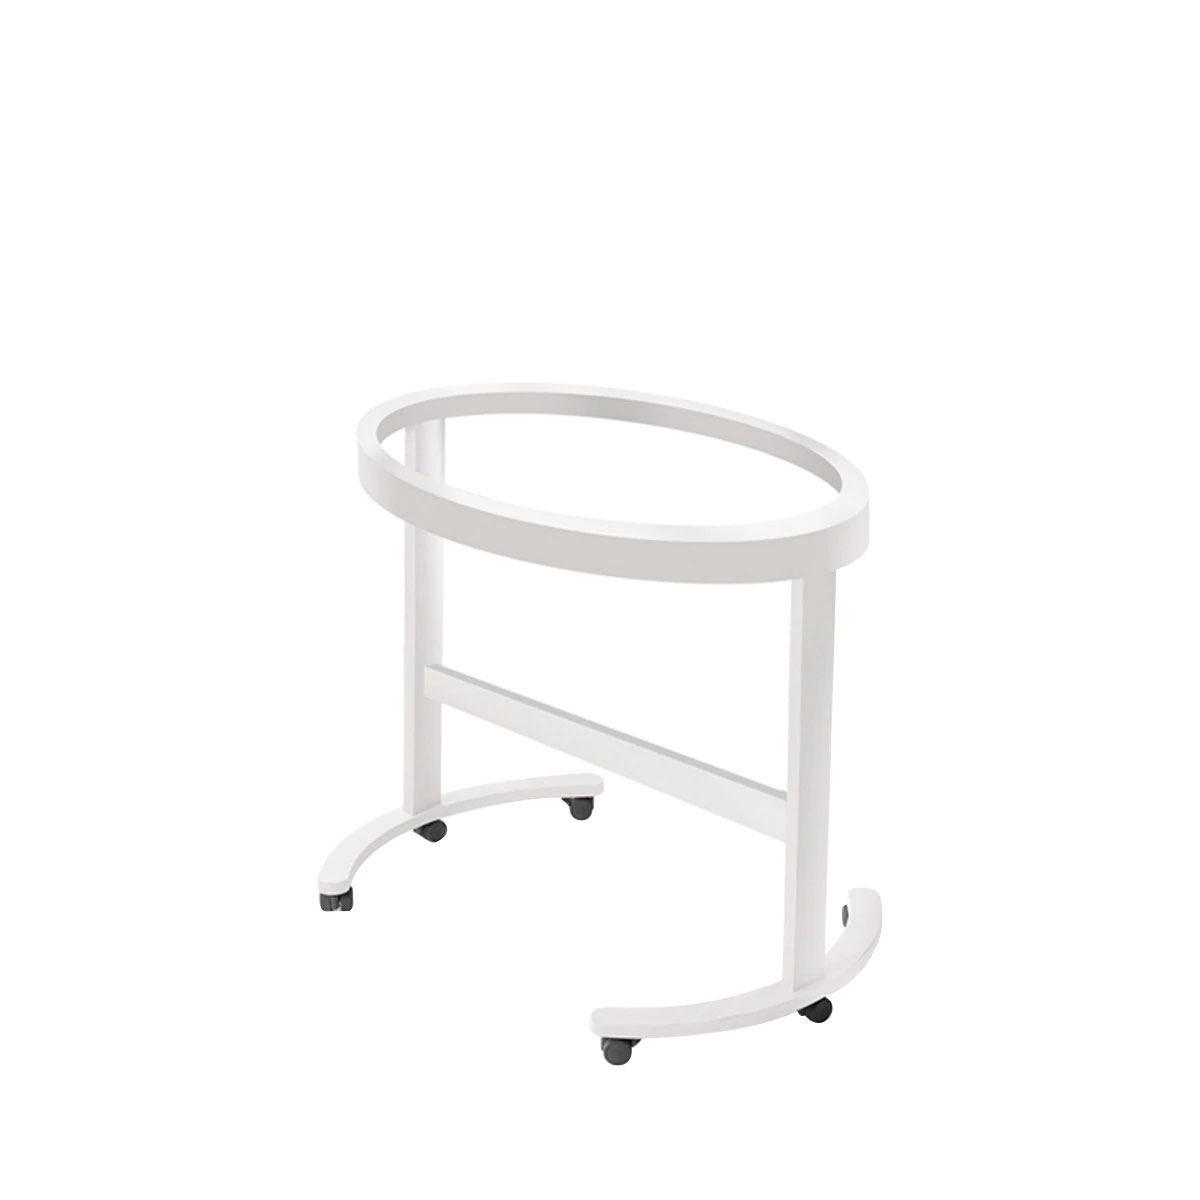 Estructura ovalada para minicuna Smart blanca de Micuna